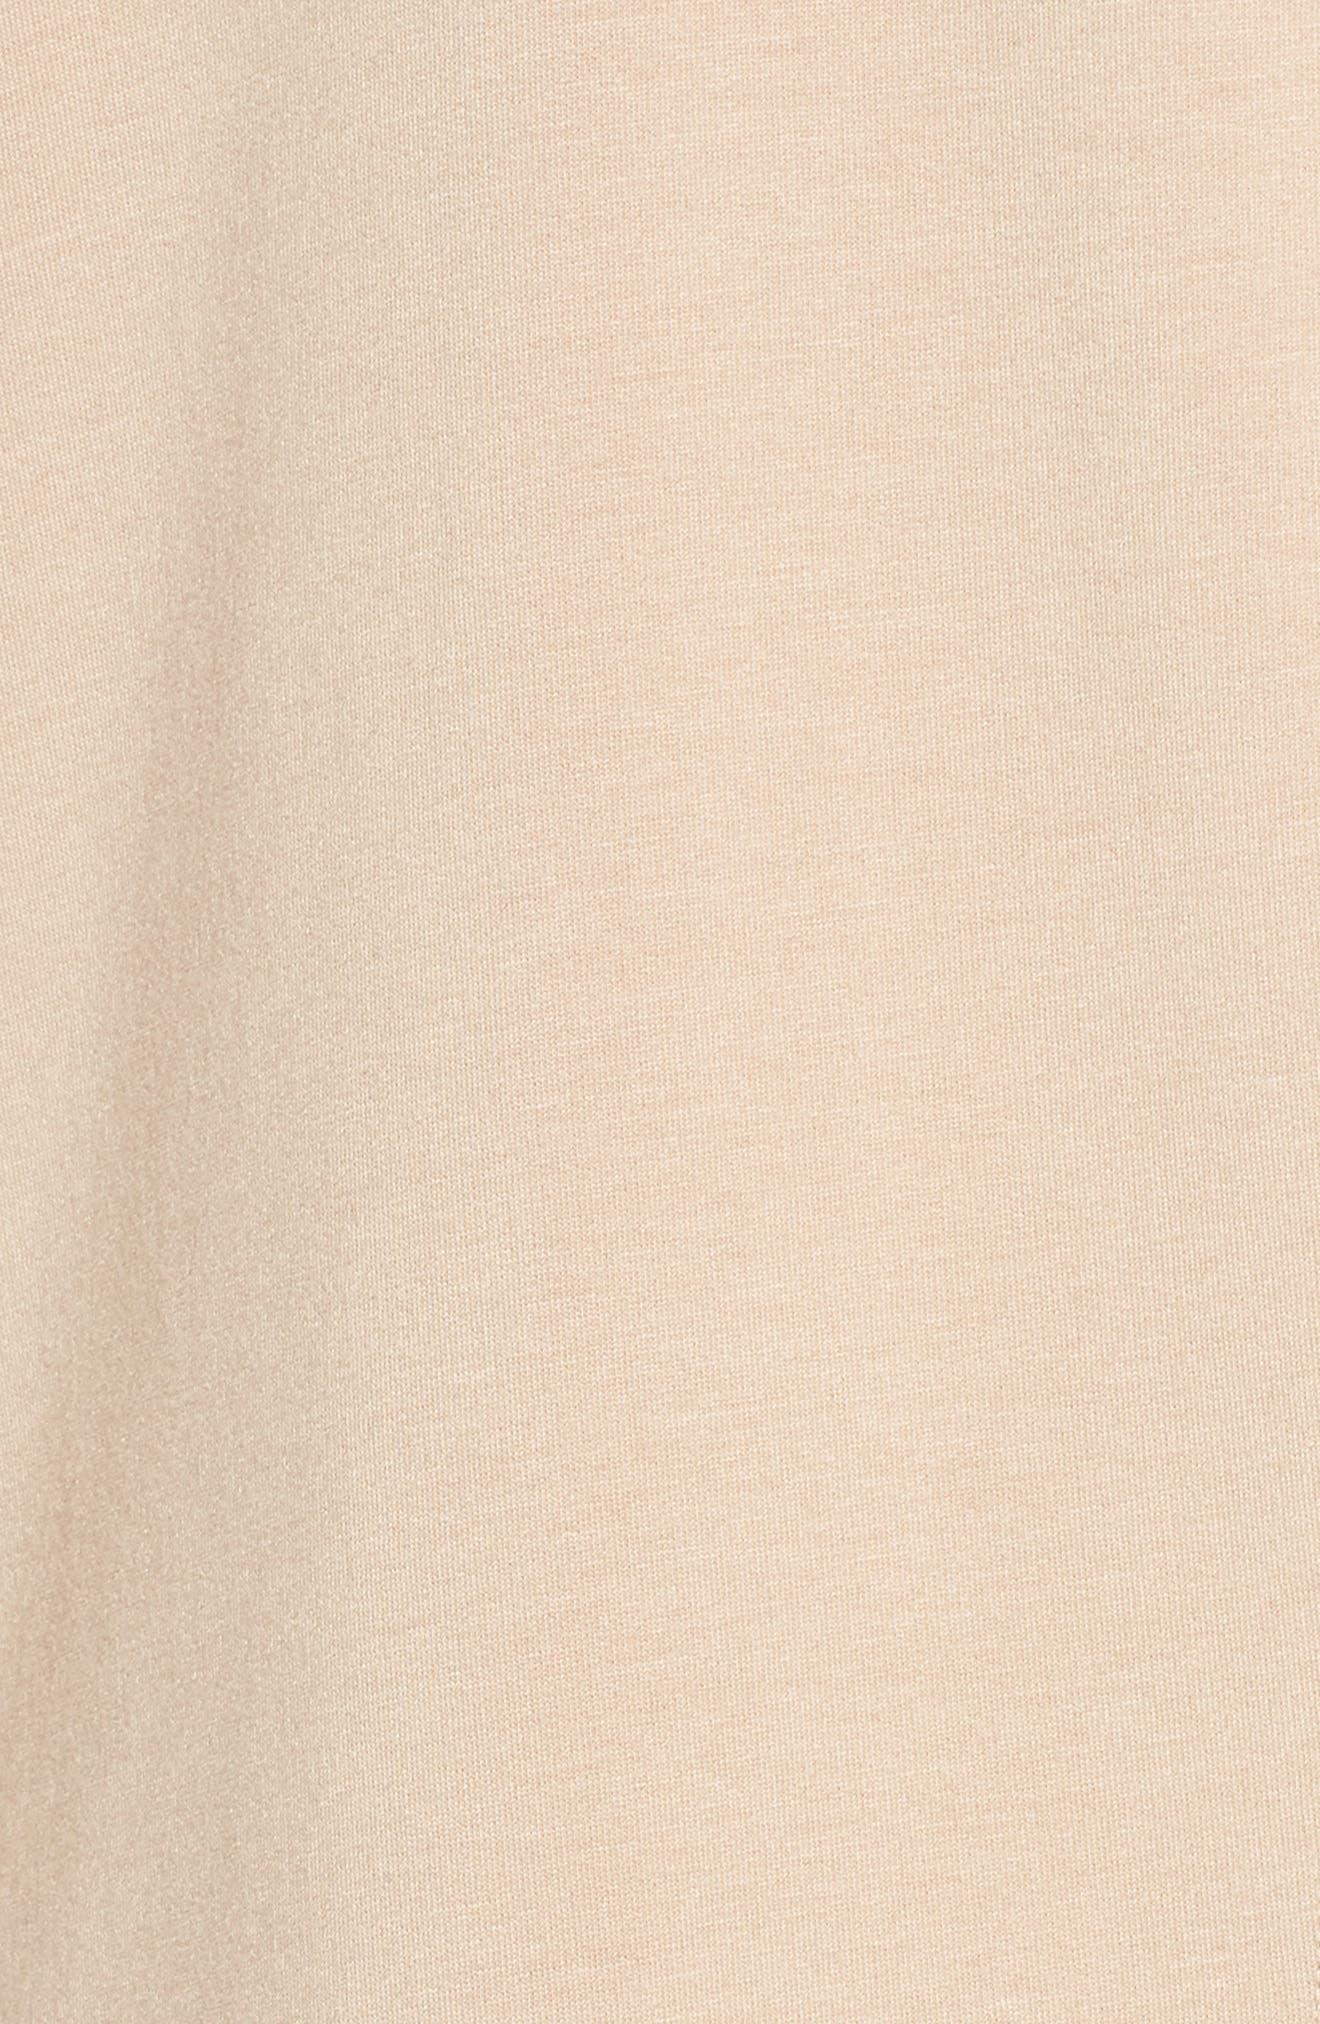 Love & Fleece Split-Back Hooded Cardigan,                             Alternate thumbnail 6, color,                             Texas Taupe